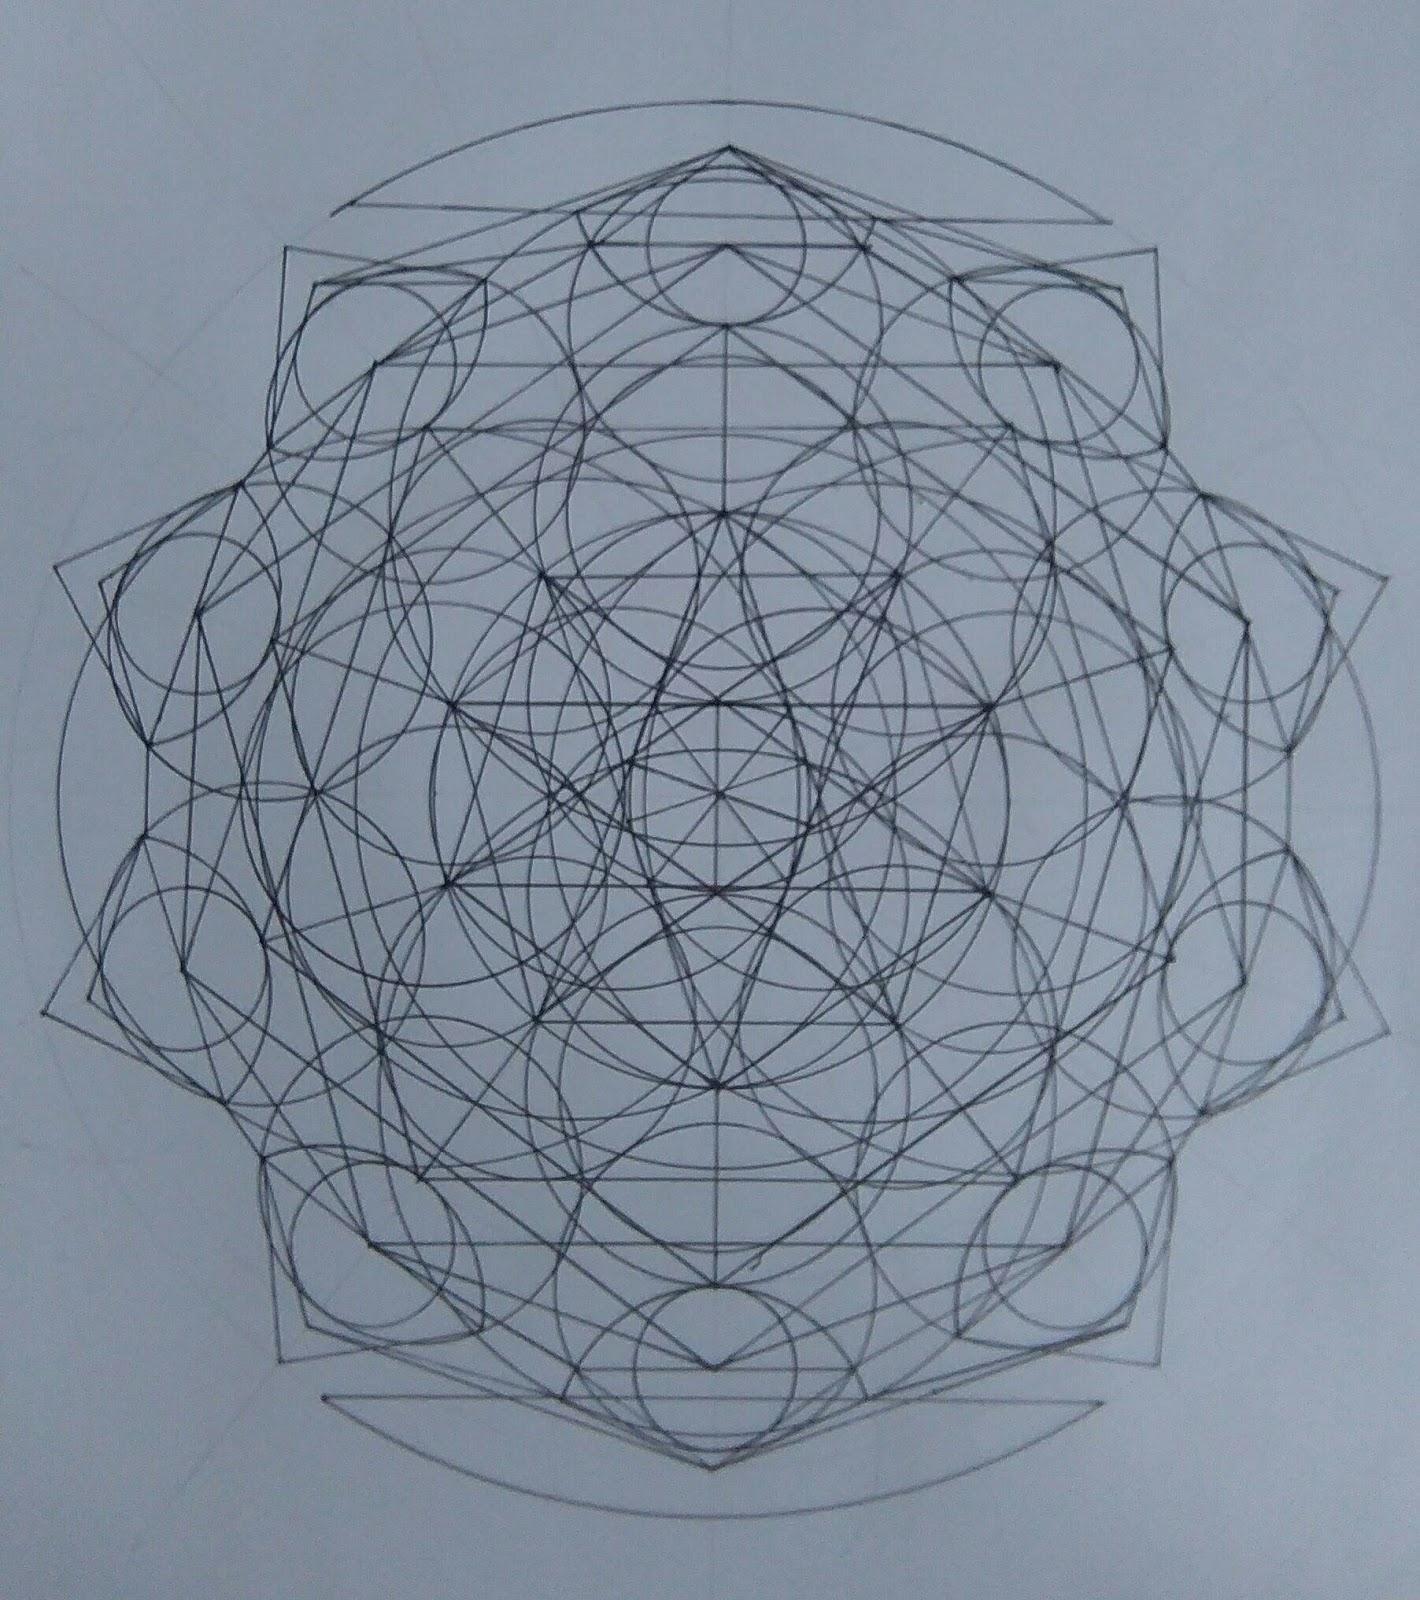 [SPOLYK] - Geometries & sketches - Page 6 47389757_1100165783503438_111108192607404032_o